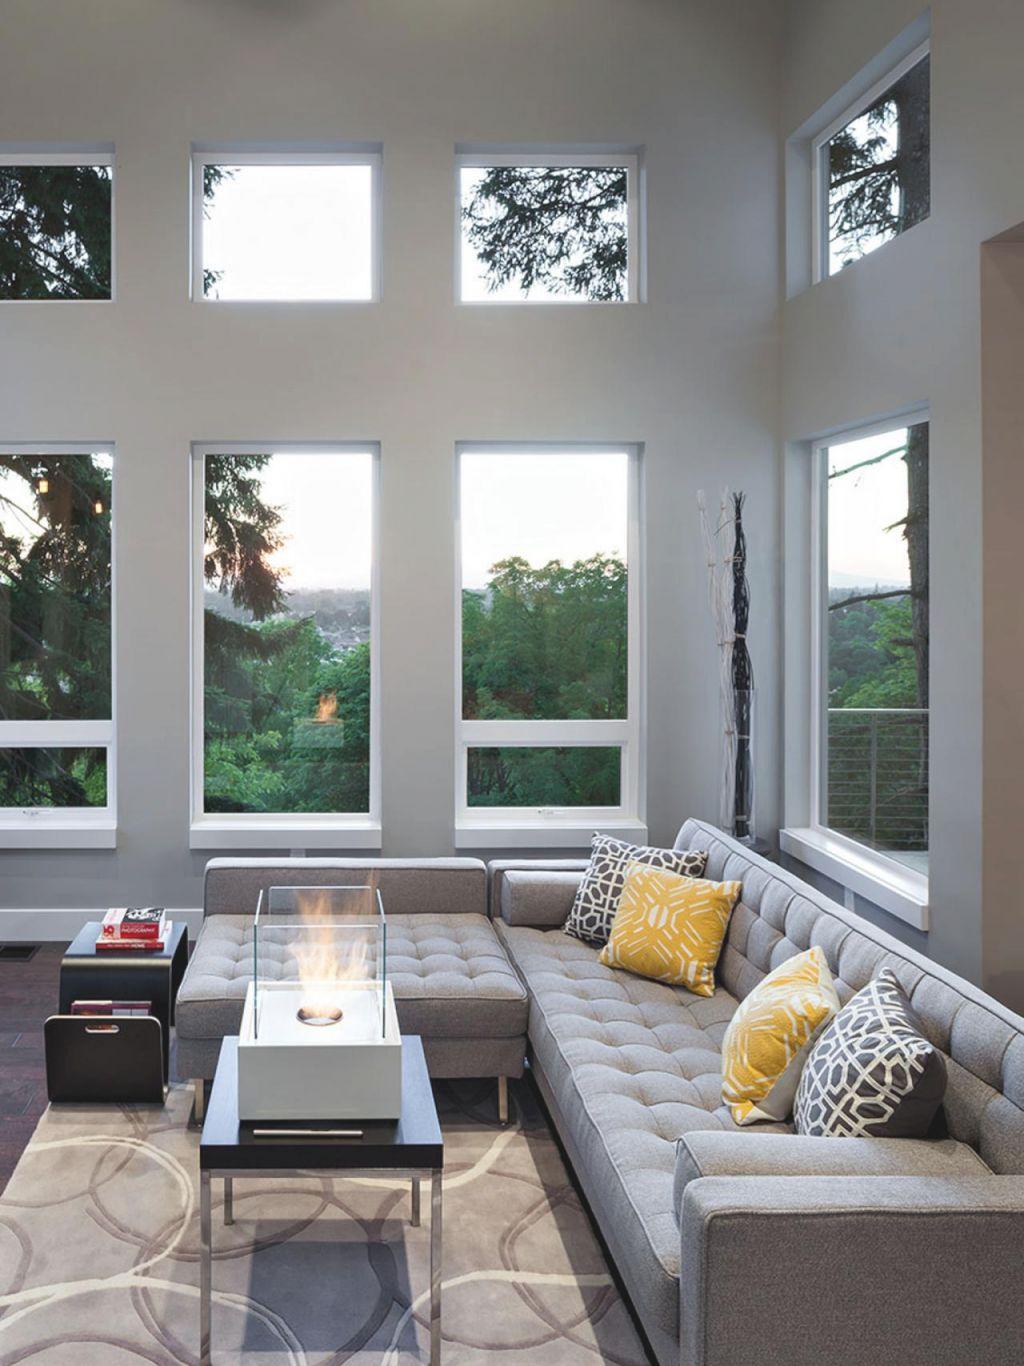 12 Living Room Ideas For A Grey Sectional | Hgtv's for Designer Living Room Furniture